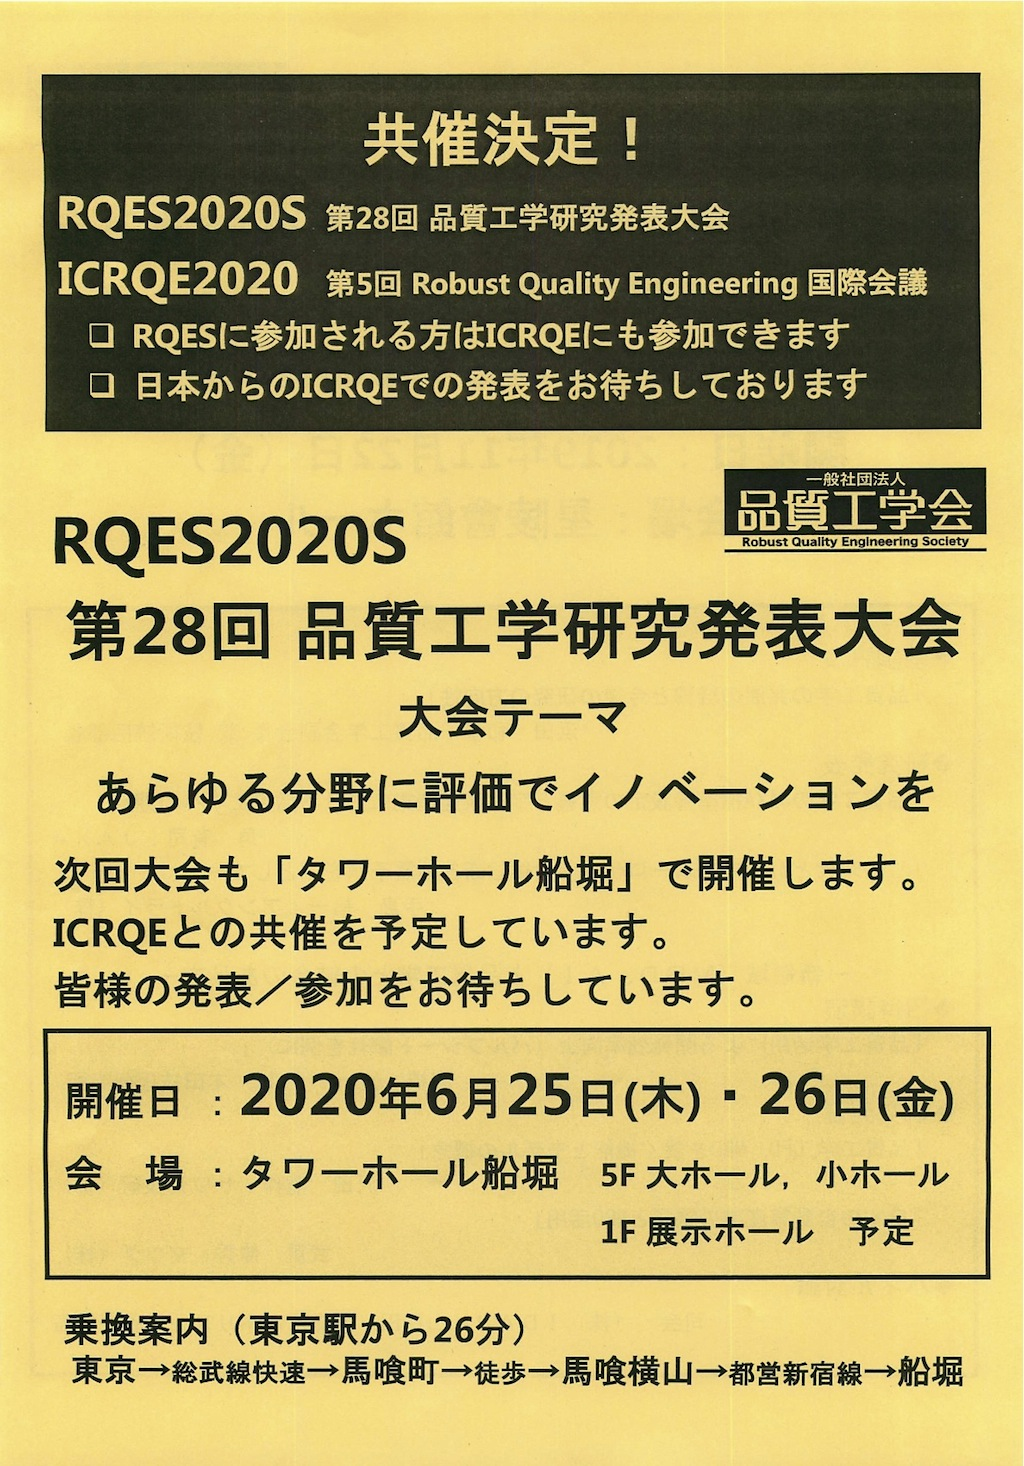 RQES2020S.jpg